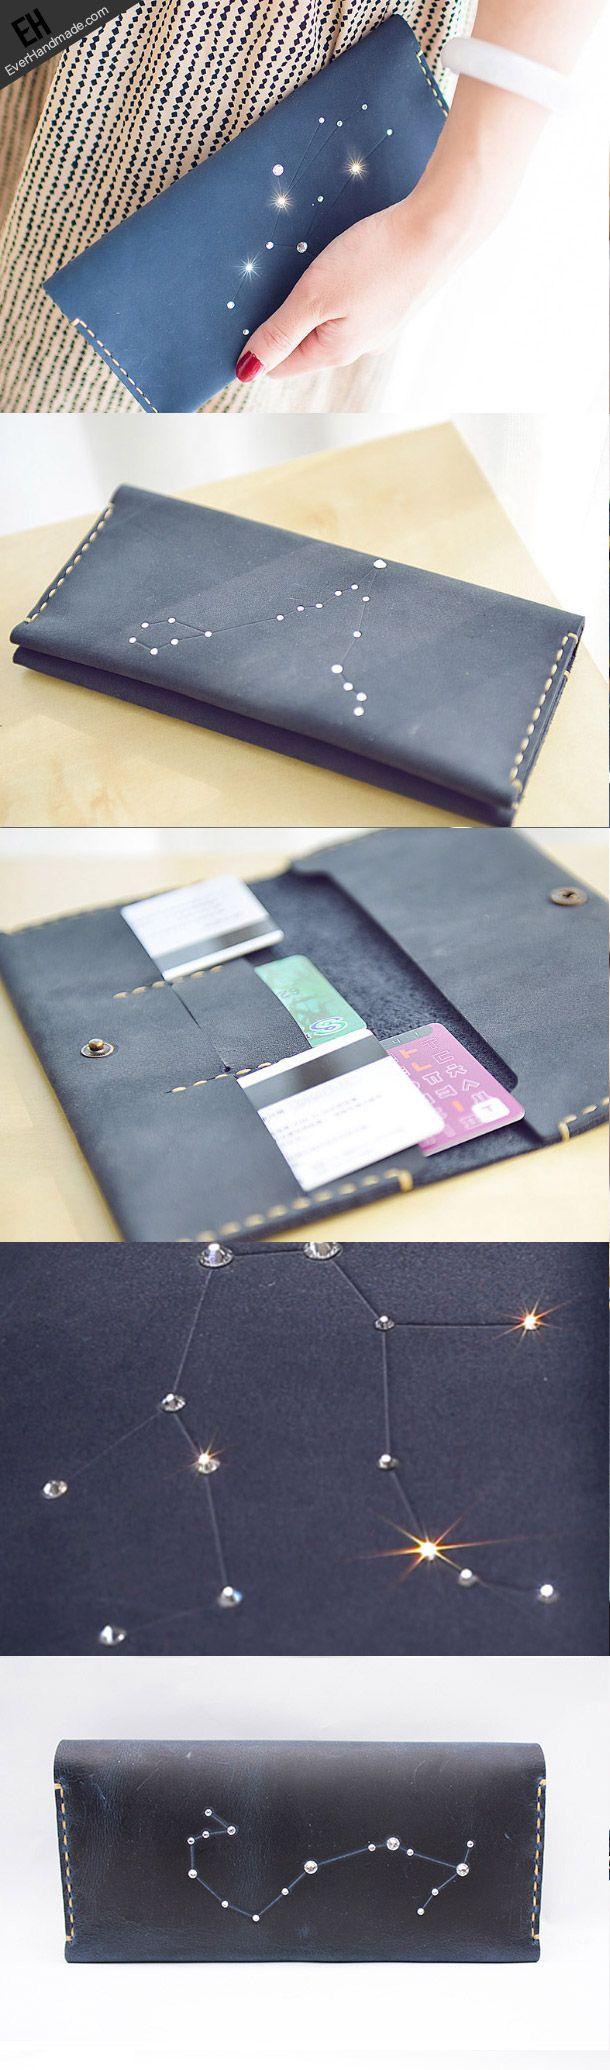 Handmade Leather long wallet purse women clutch wallet constellation